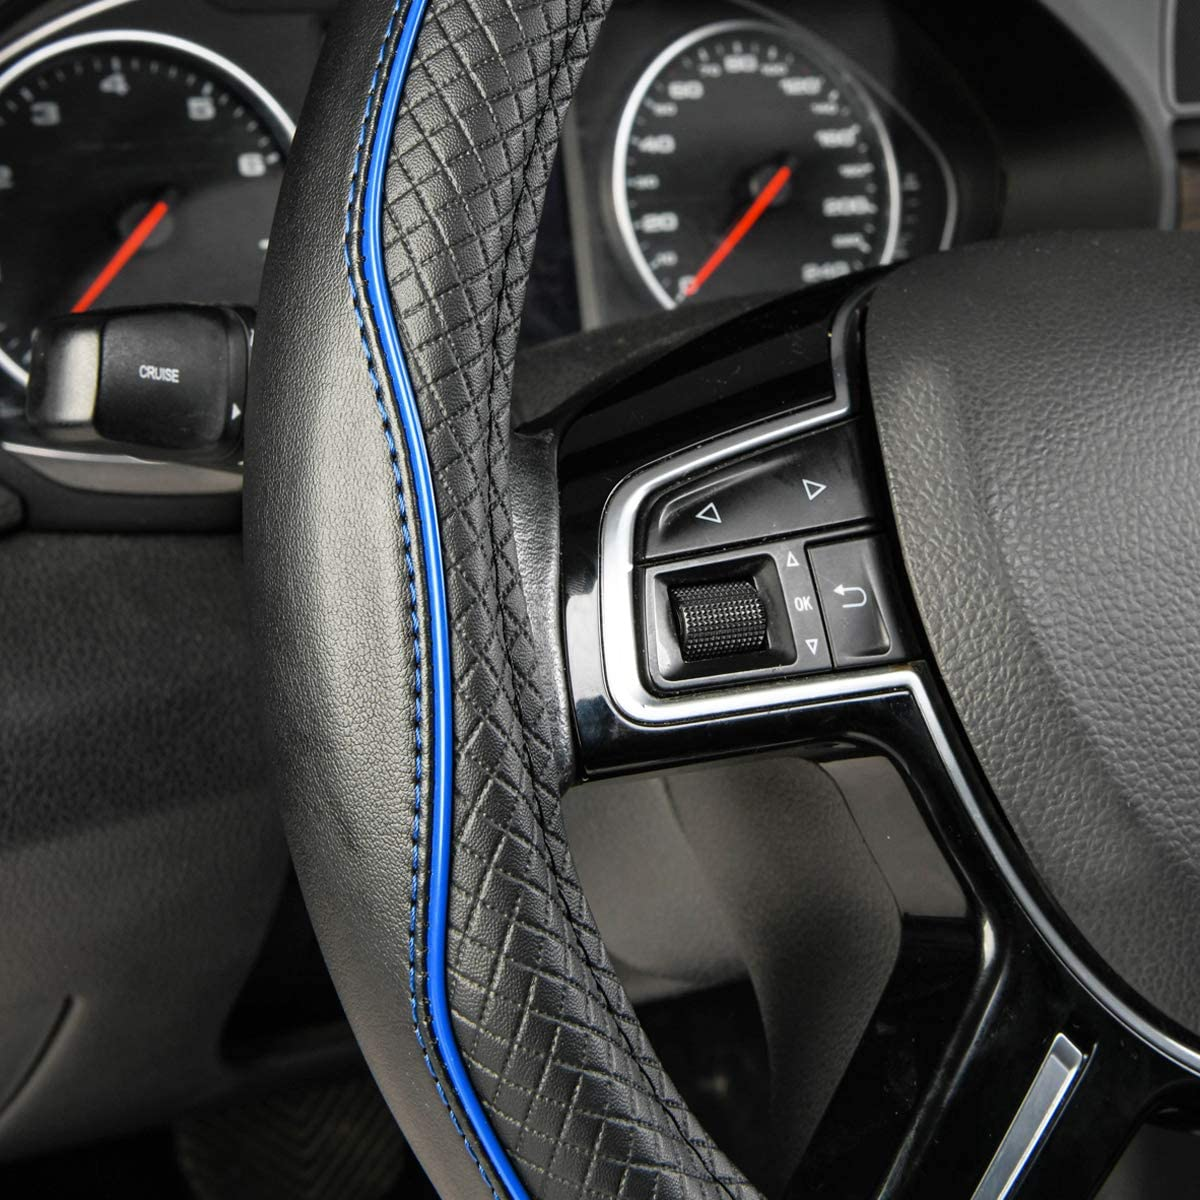 Amazon Basics Lenkradbezug Aus Kunstleder 38 Cm Schwarz Blau Auto